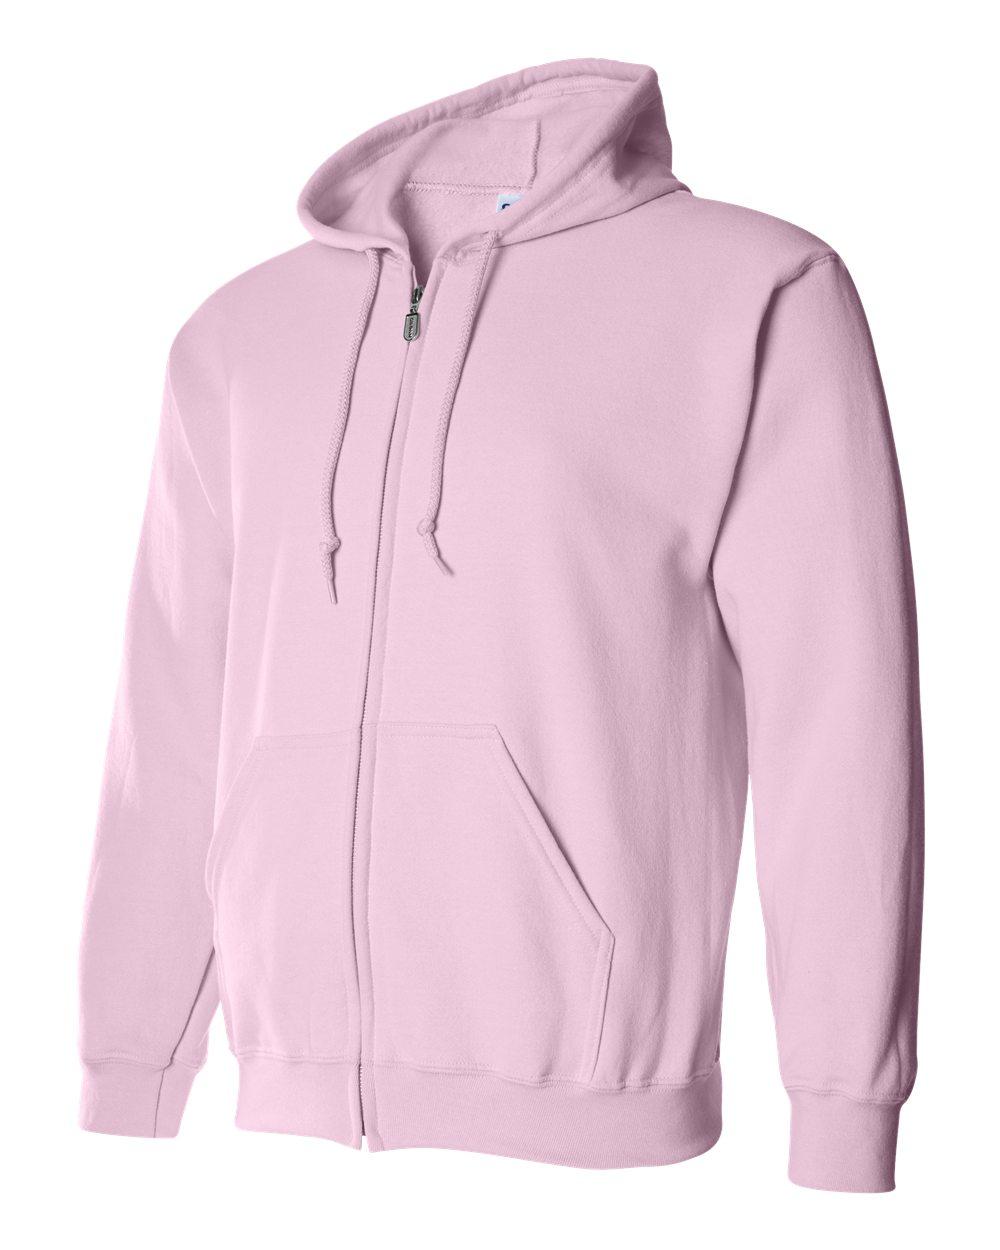 a26ca3fa Gildan 18600 - Heavy Blend Full-Zip Hooded Sweatshirt - Friendly Arctic  Printing